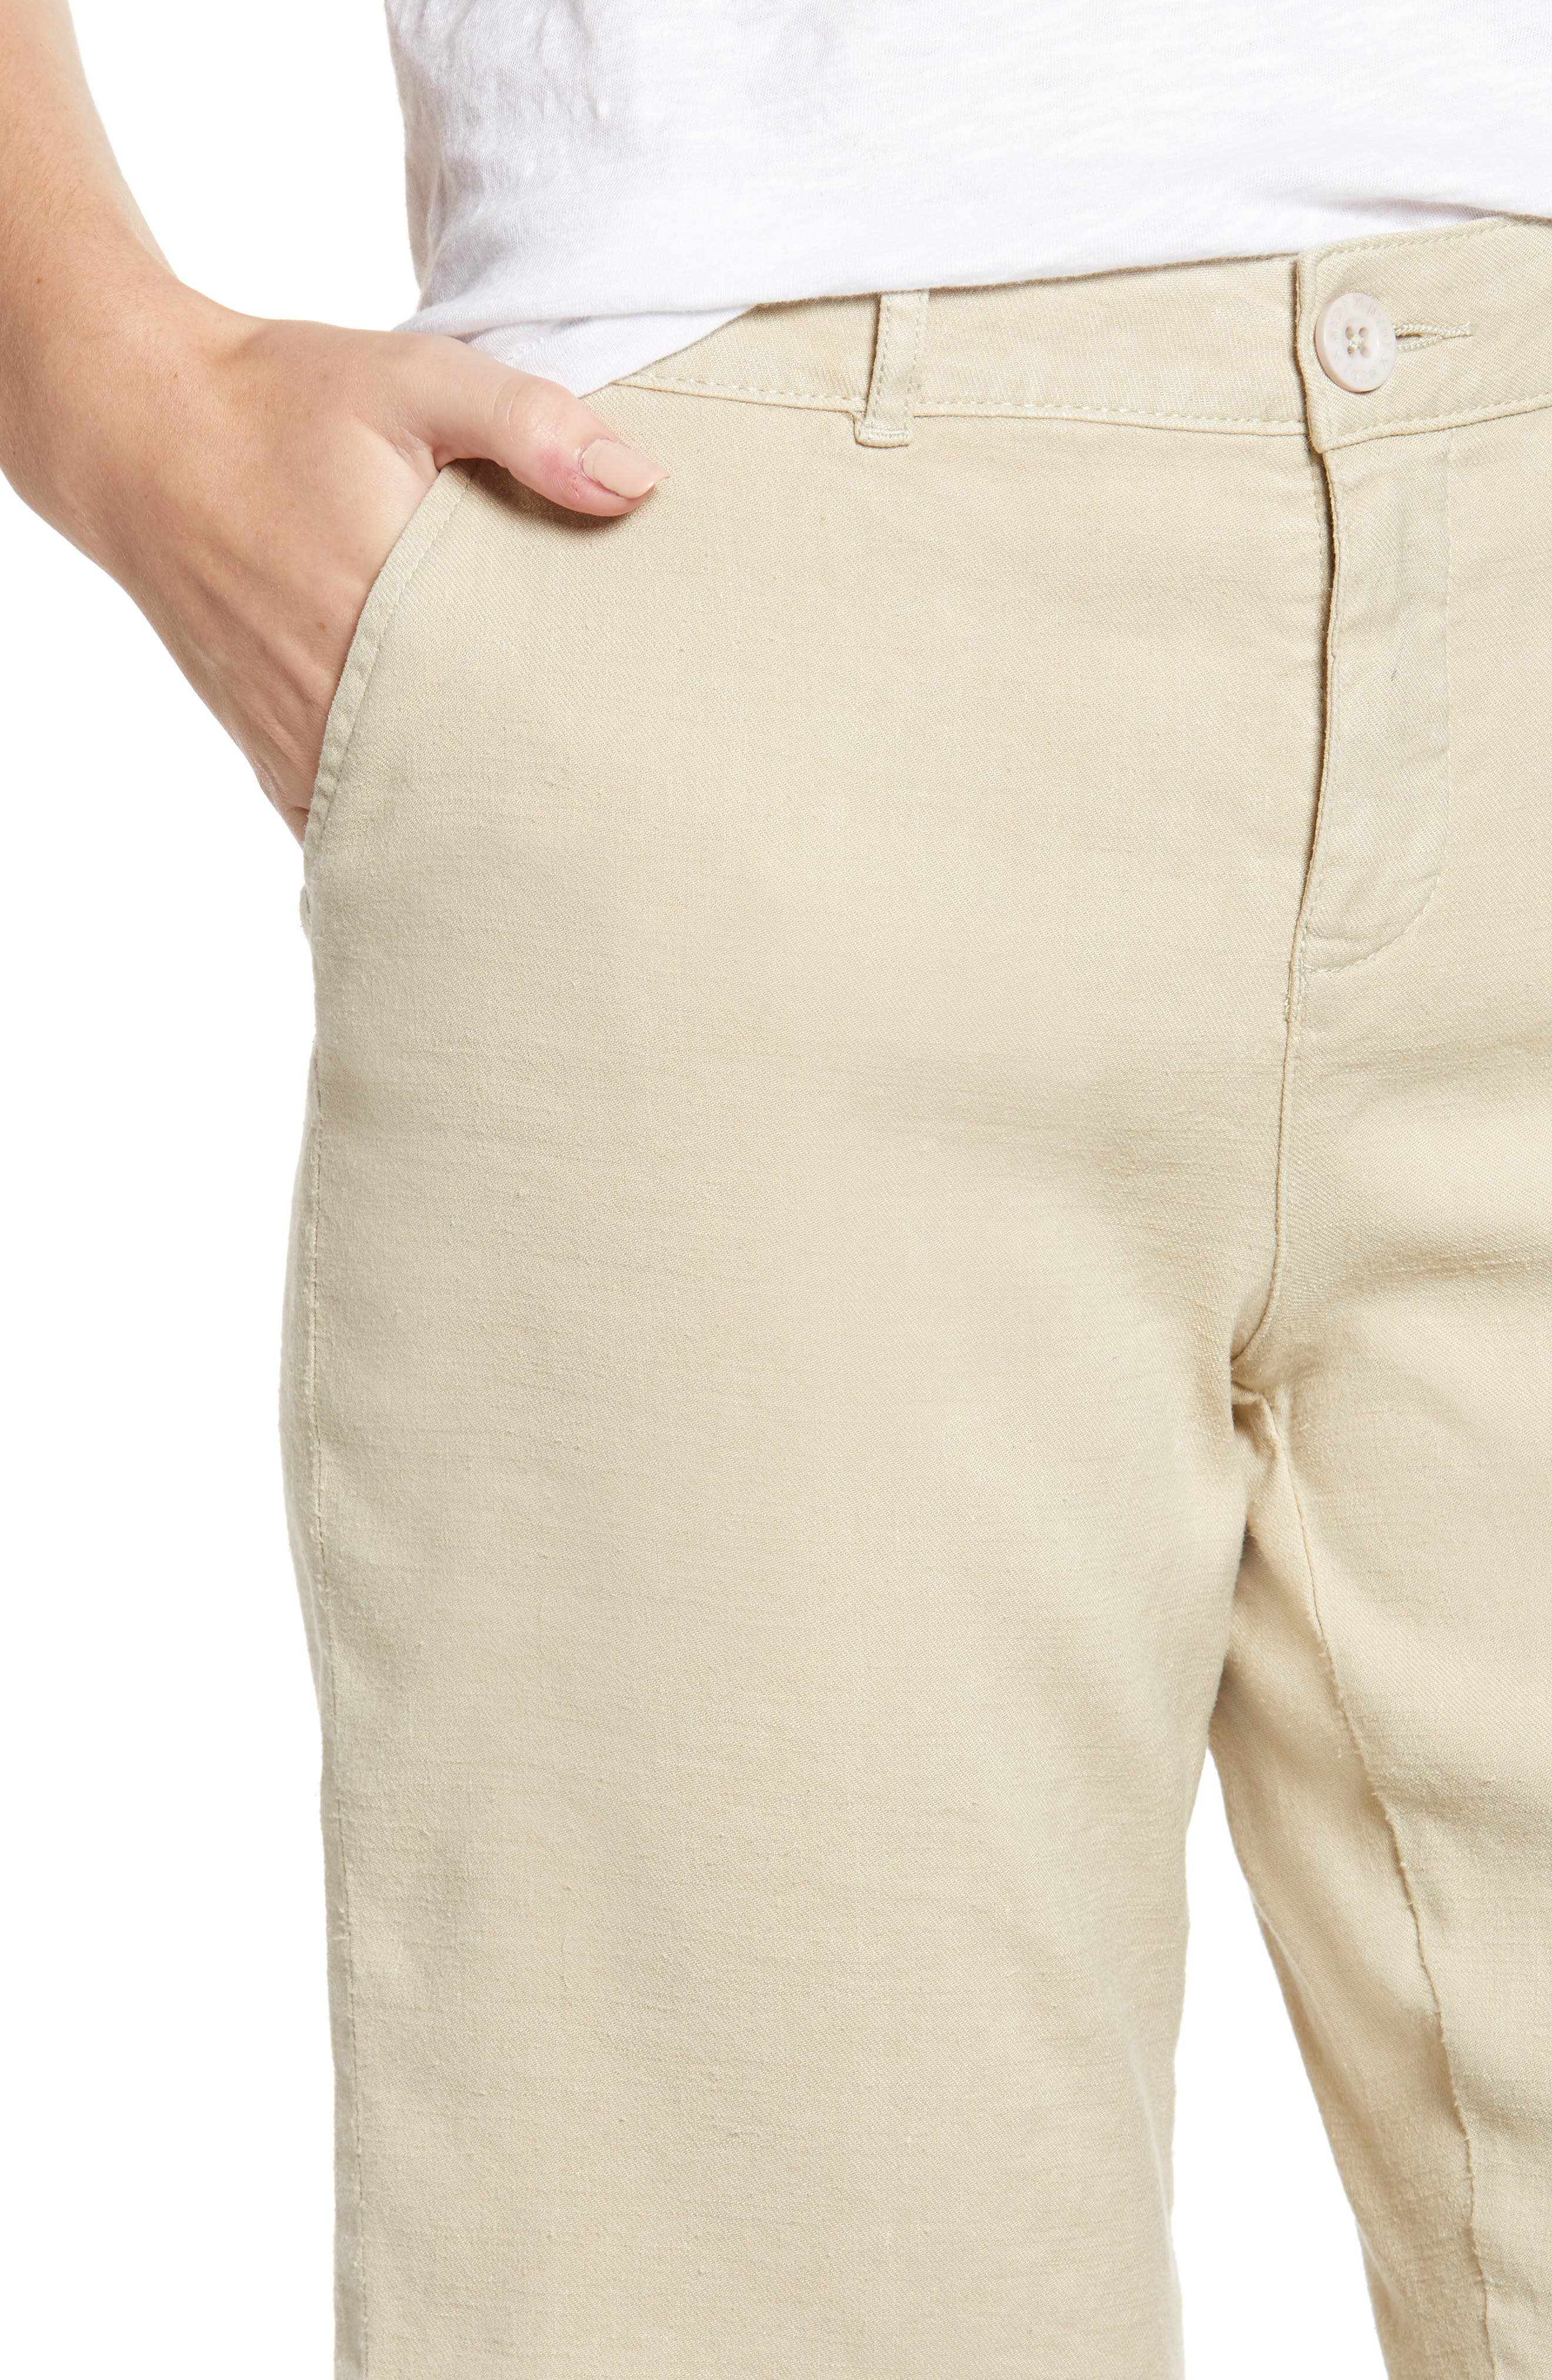 Stretch Linen Blend Bermuda Shorts,                             Alternate thumbnail 11, color,